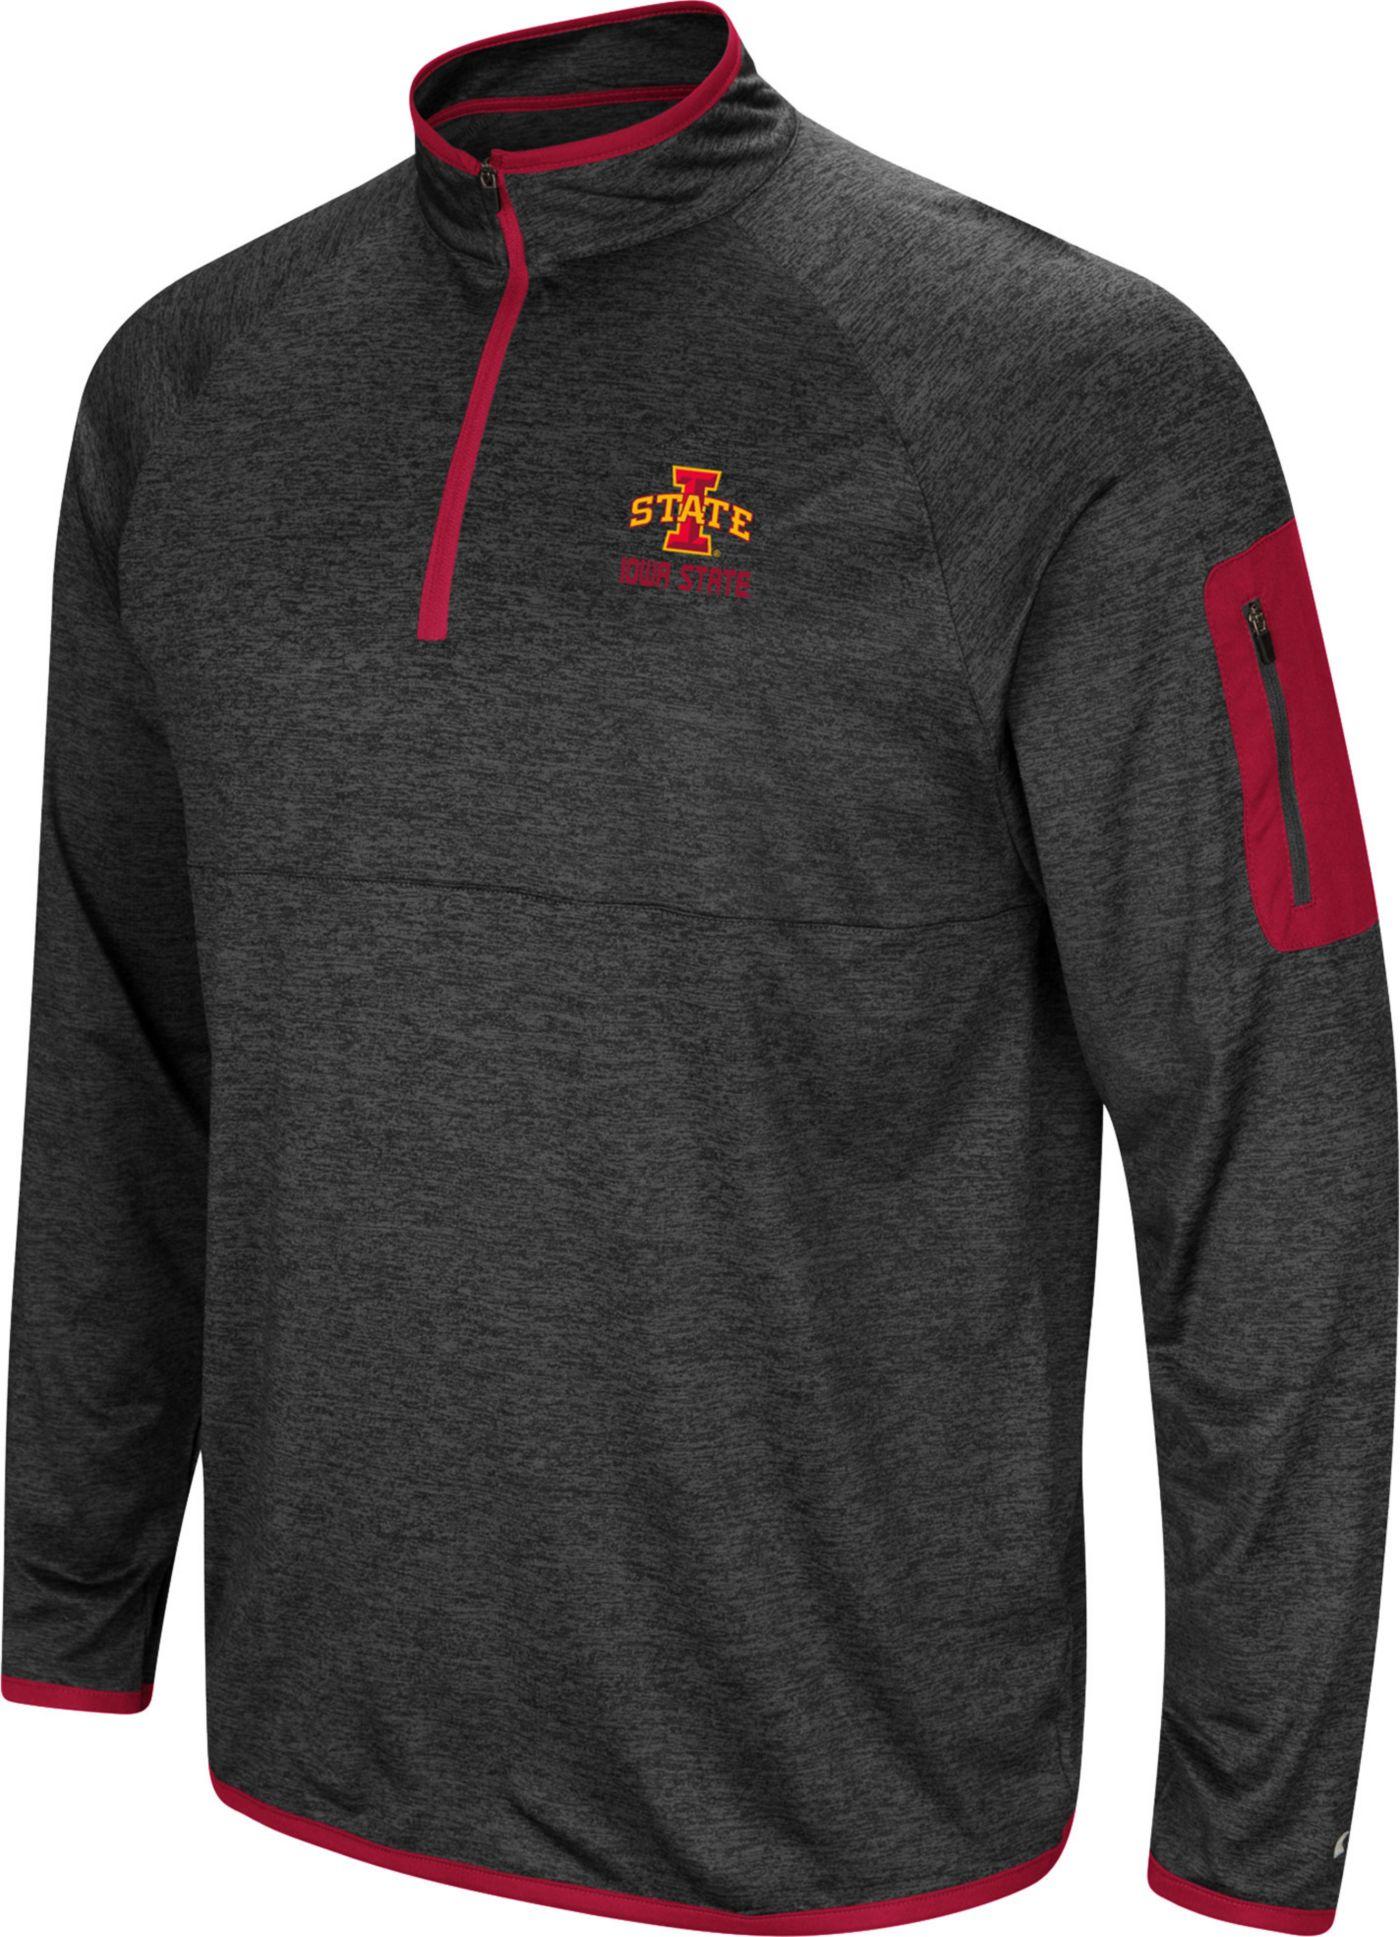 Colosseum Men's Iowa State Cyclones Grey Indus River Quarter-Zip Shirt